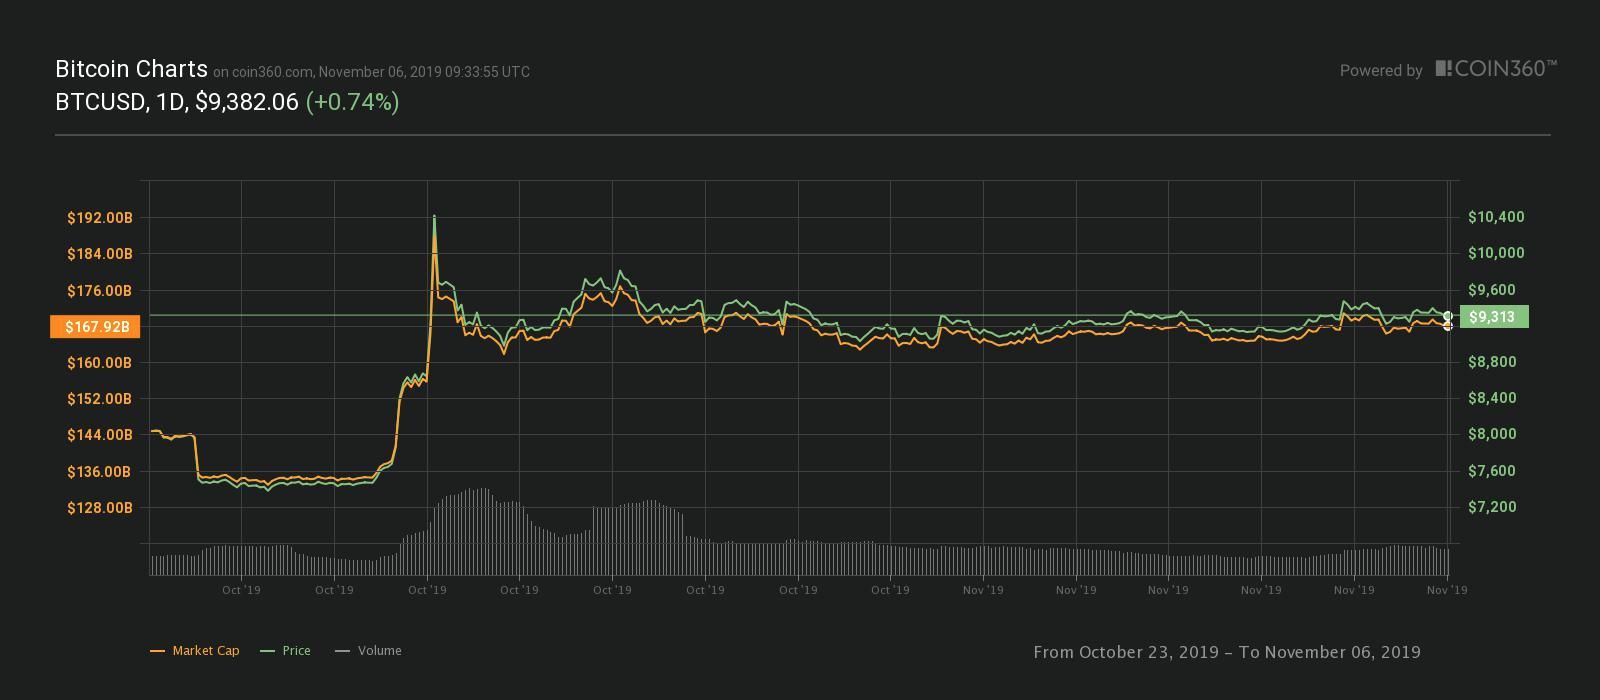 BTC/USD chart, Oct. 23-Nov. 6 2019